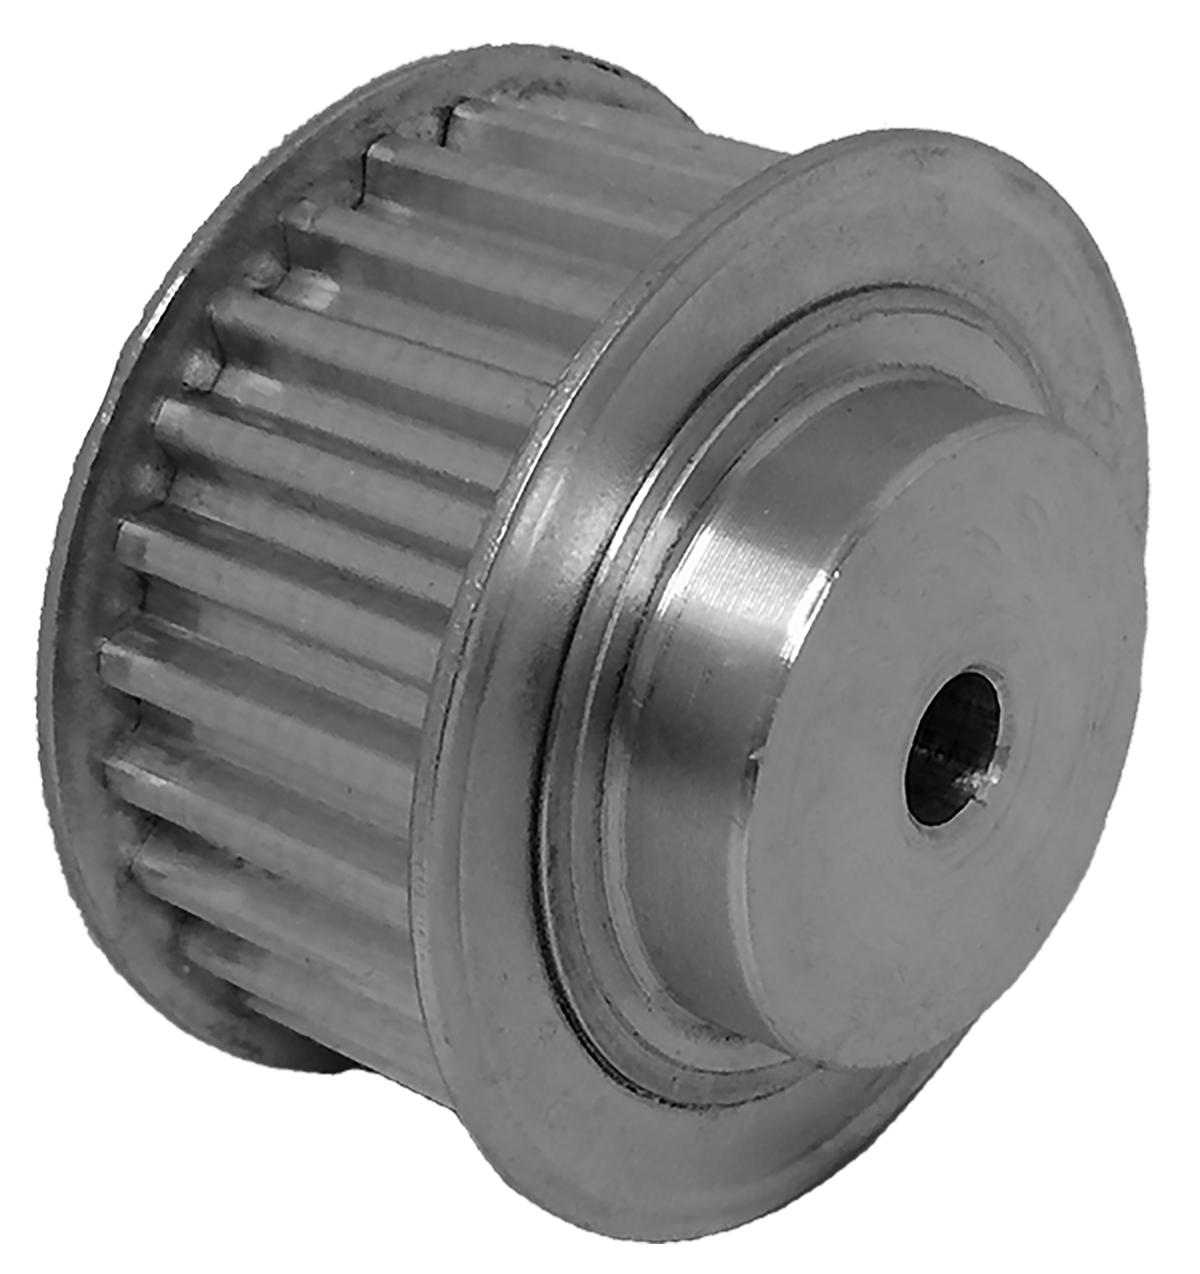 27T5/26-2 - Aluminum Metric Pulleys